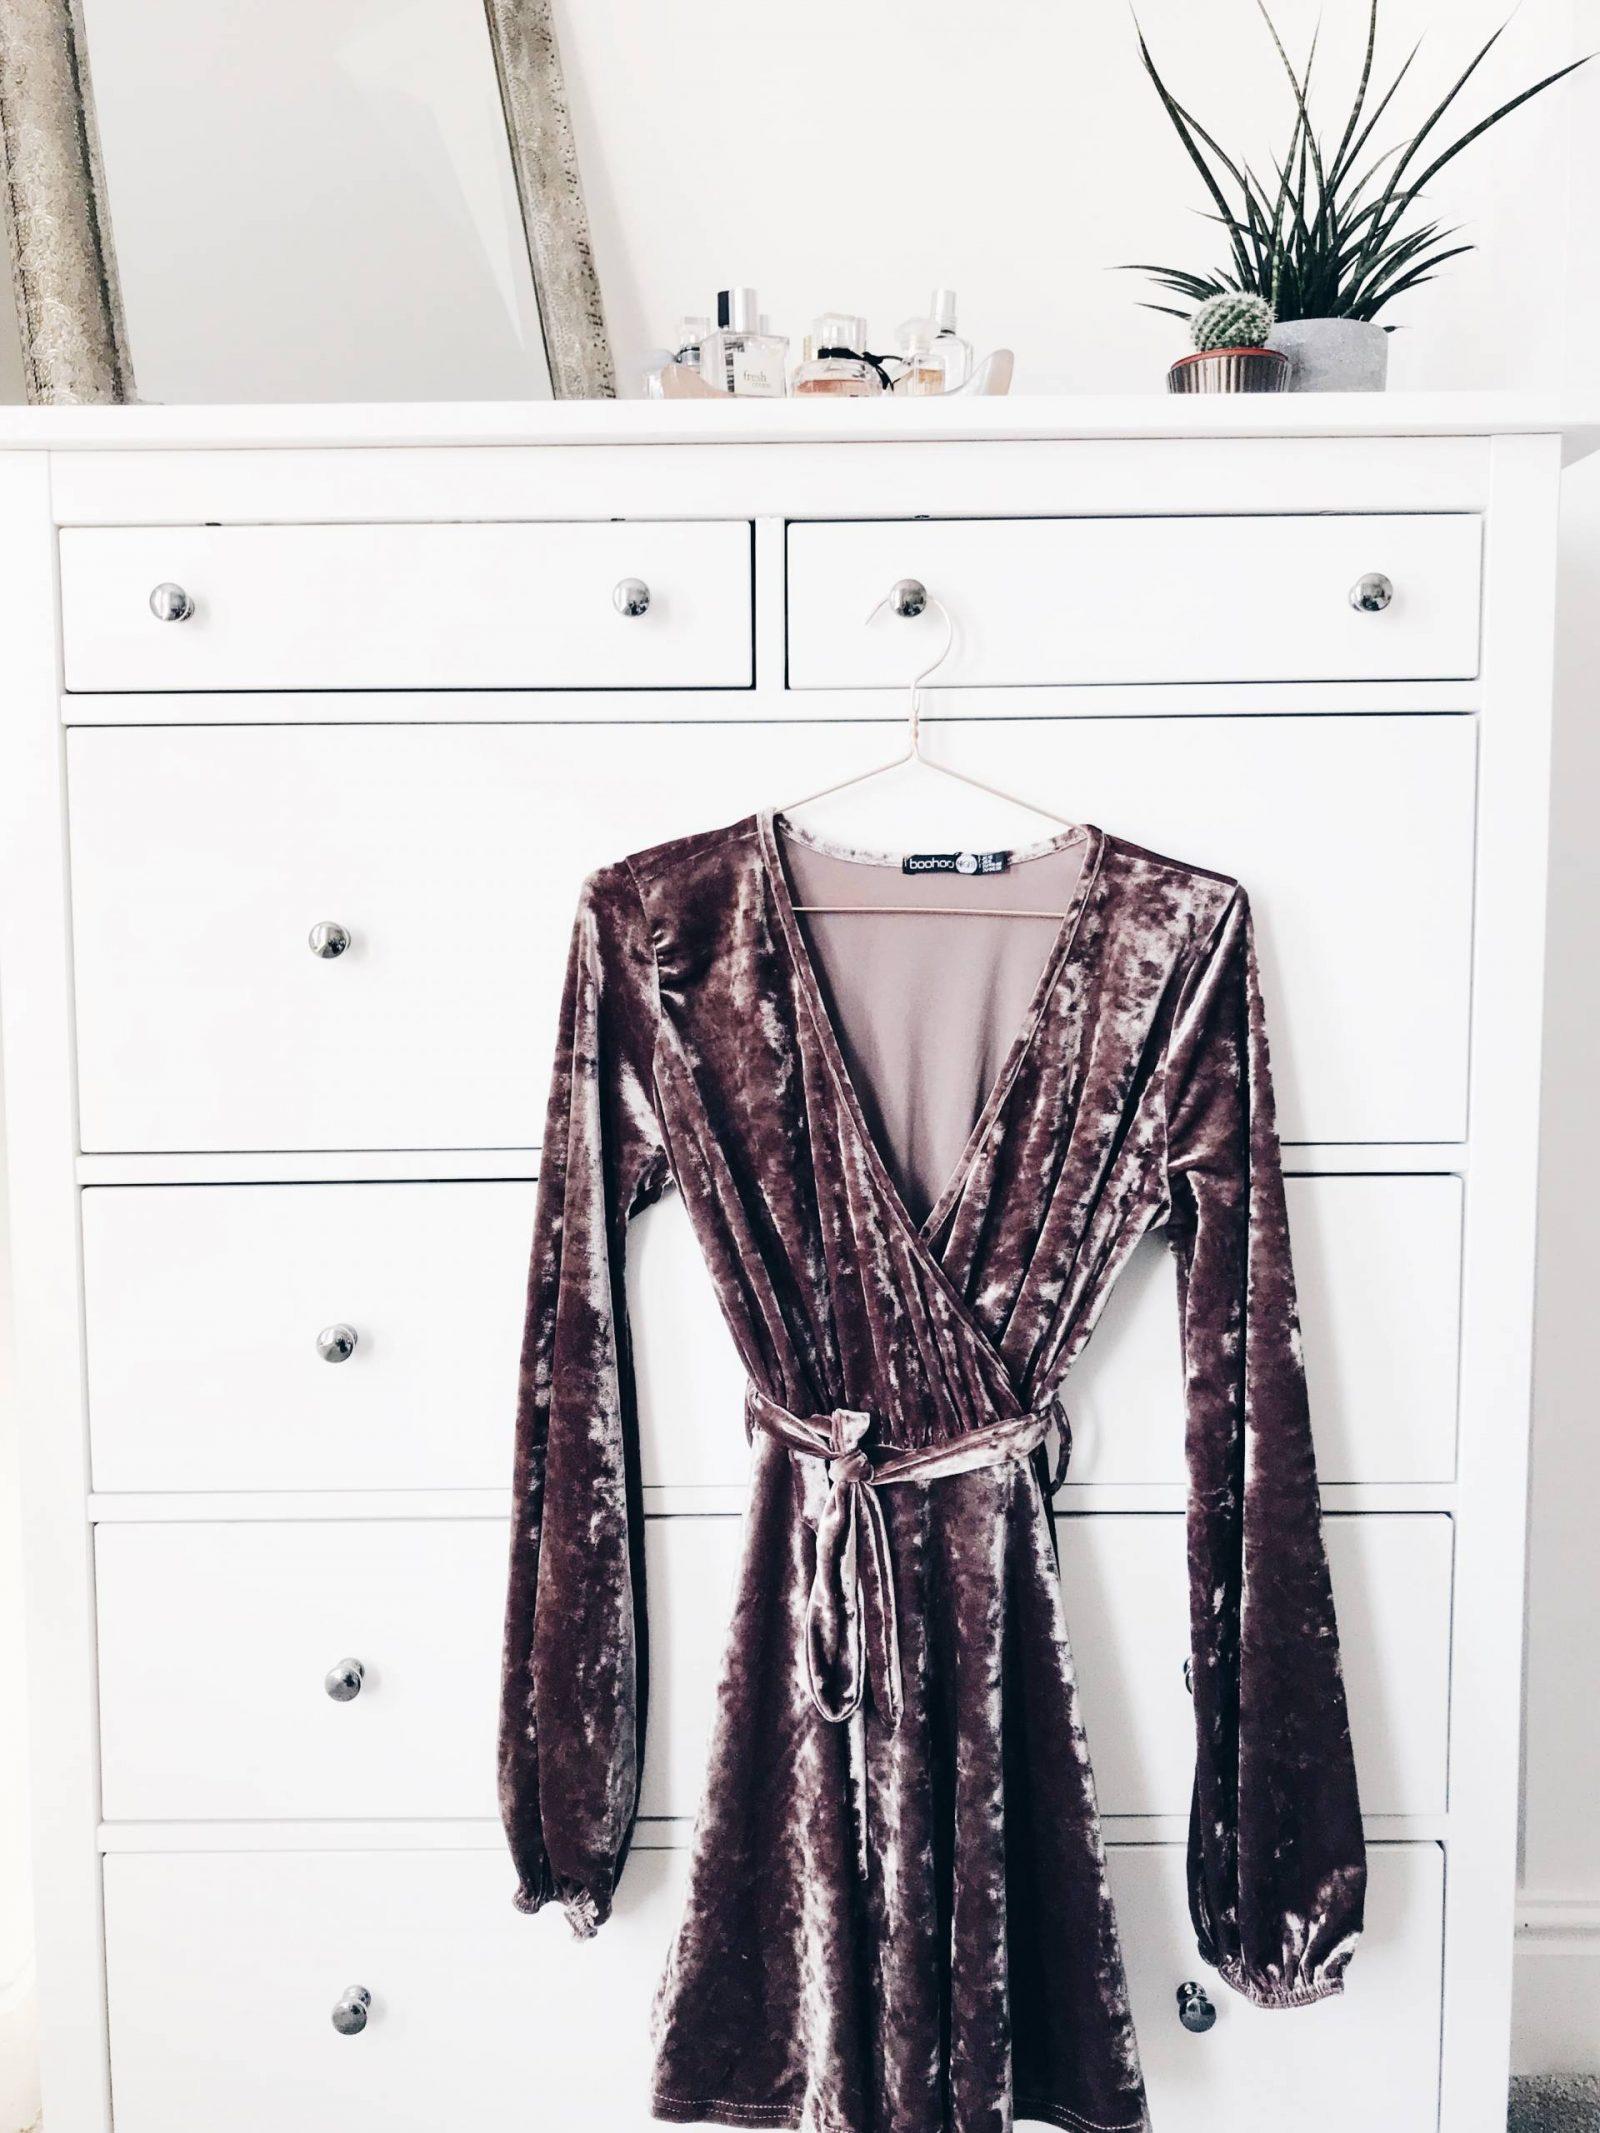 Amy Farquhar Boohoo Blogger Shop Style Party Dress GRWM